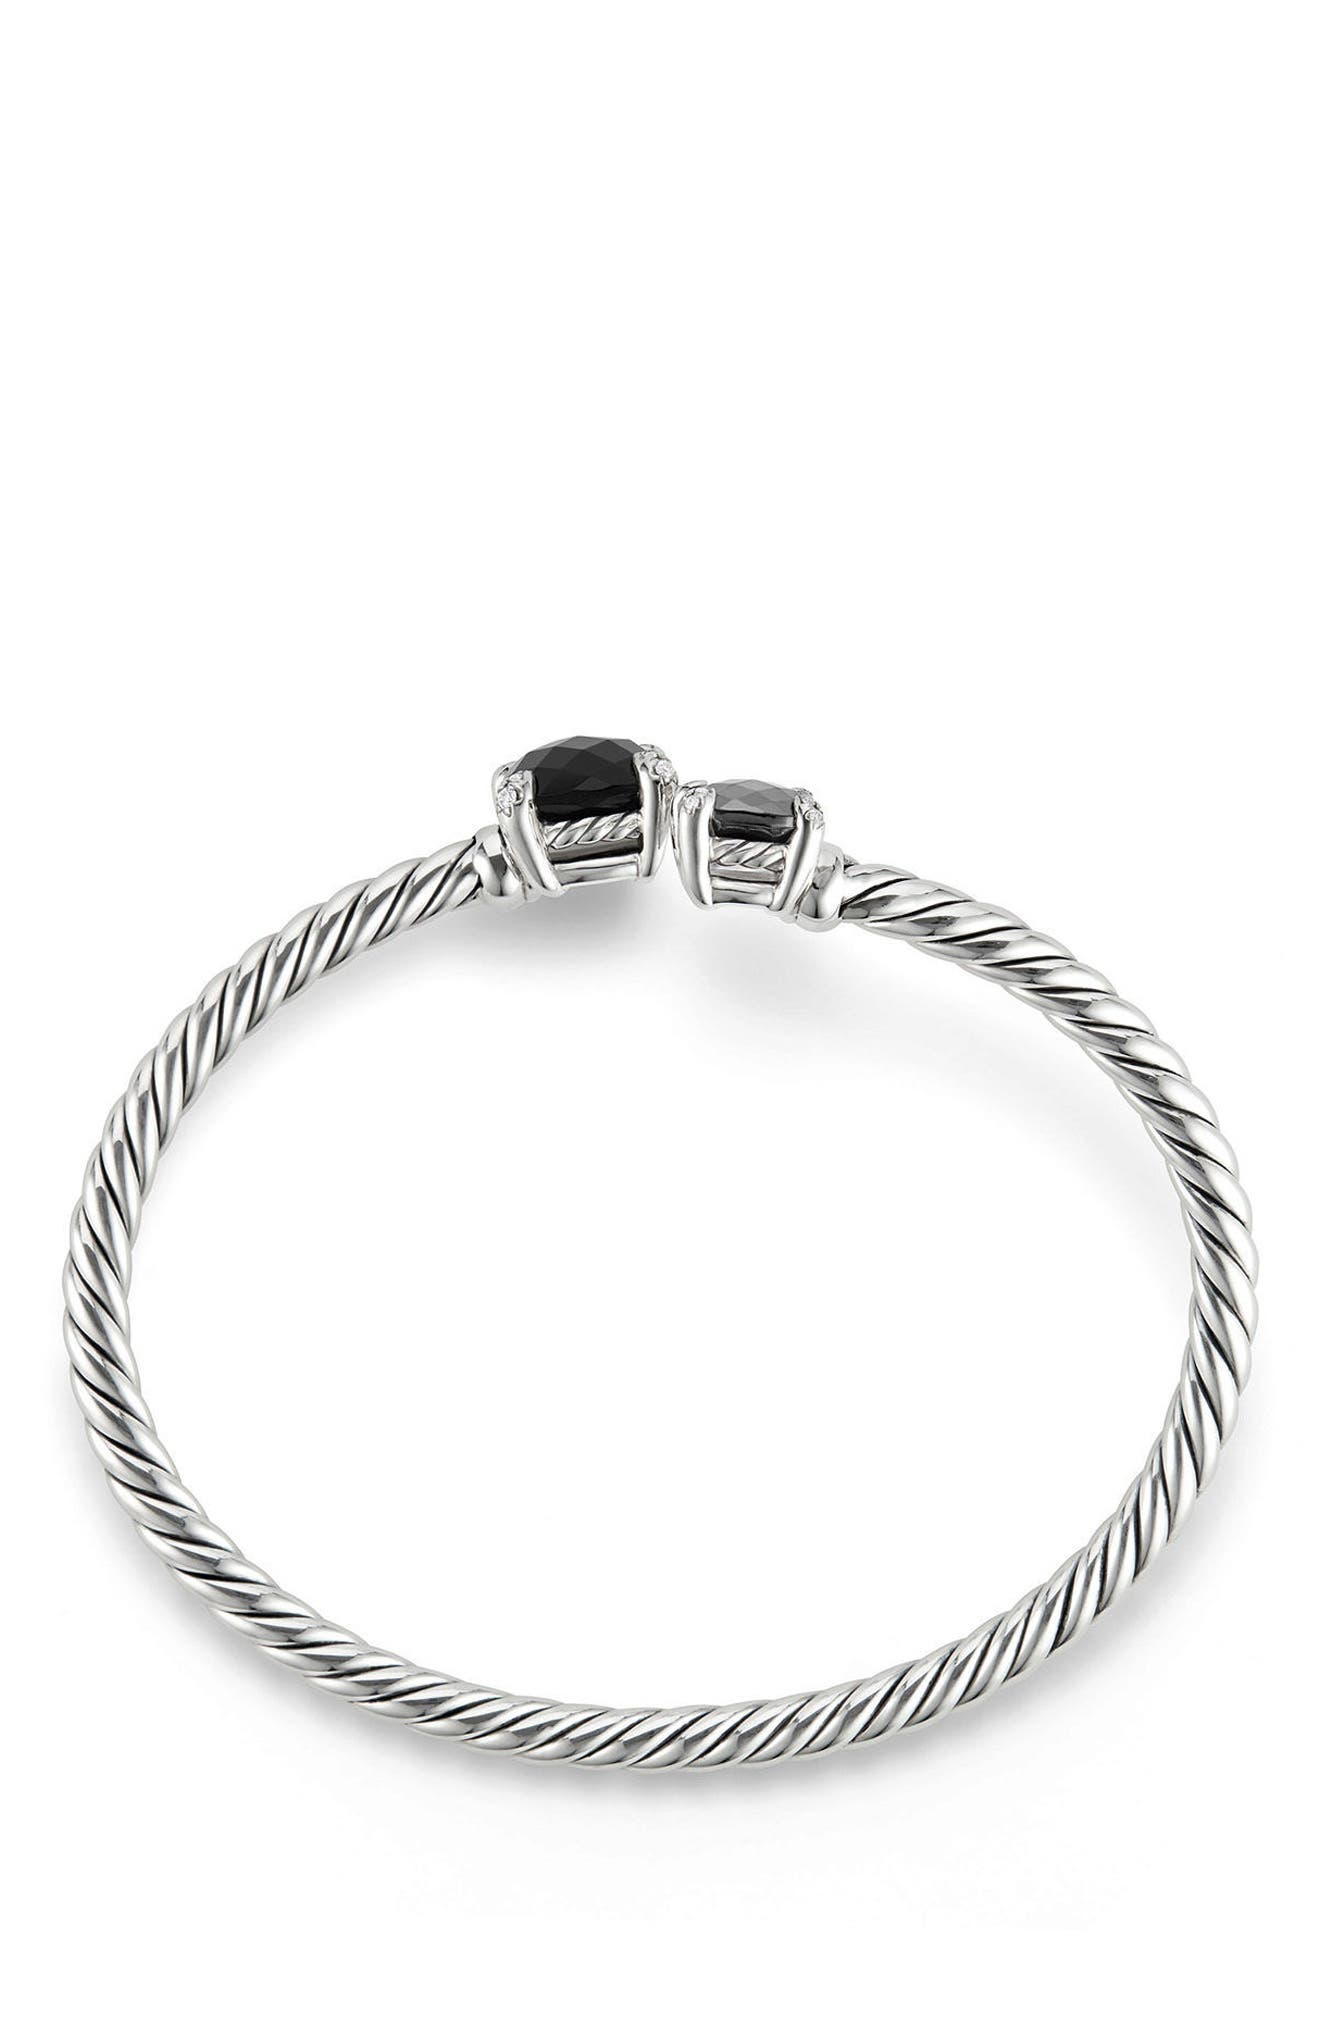 Chatelaine Bypass Bracelet with Diamonds,                             Alternate thumbnail 3, color,                             BLACK ONYX